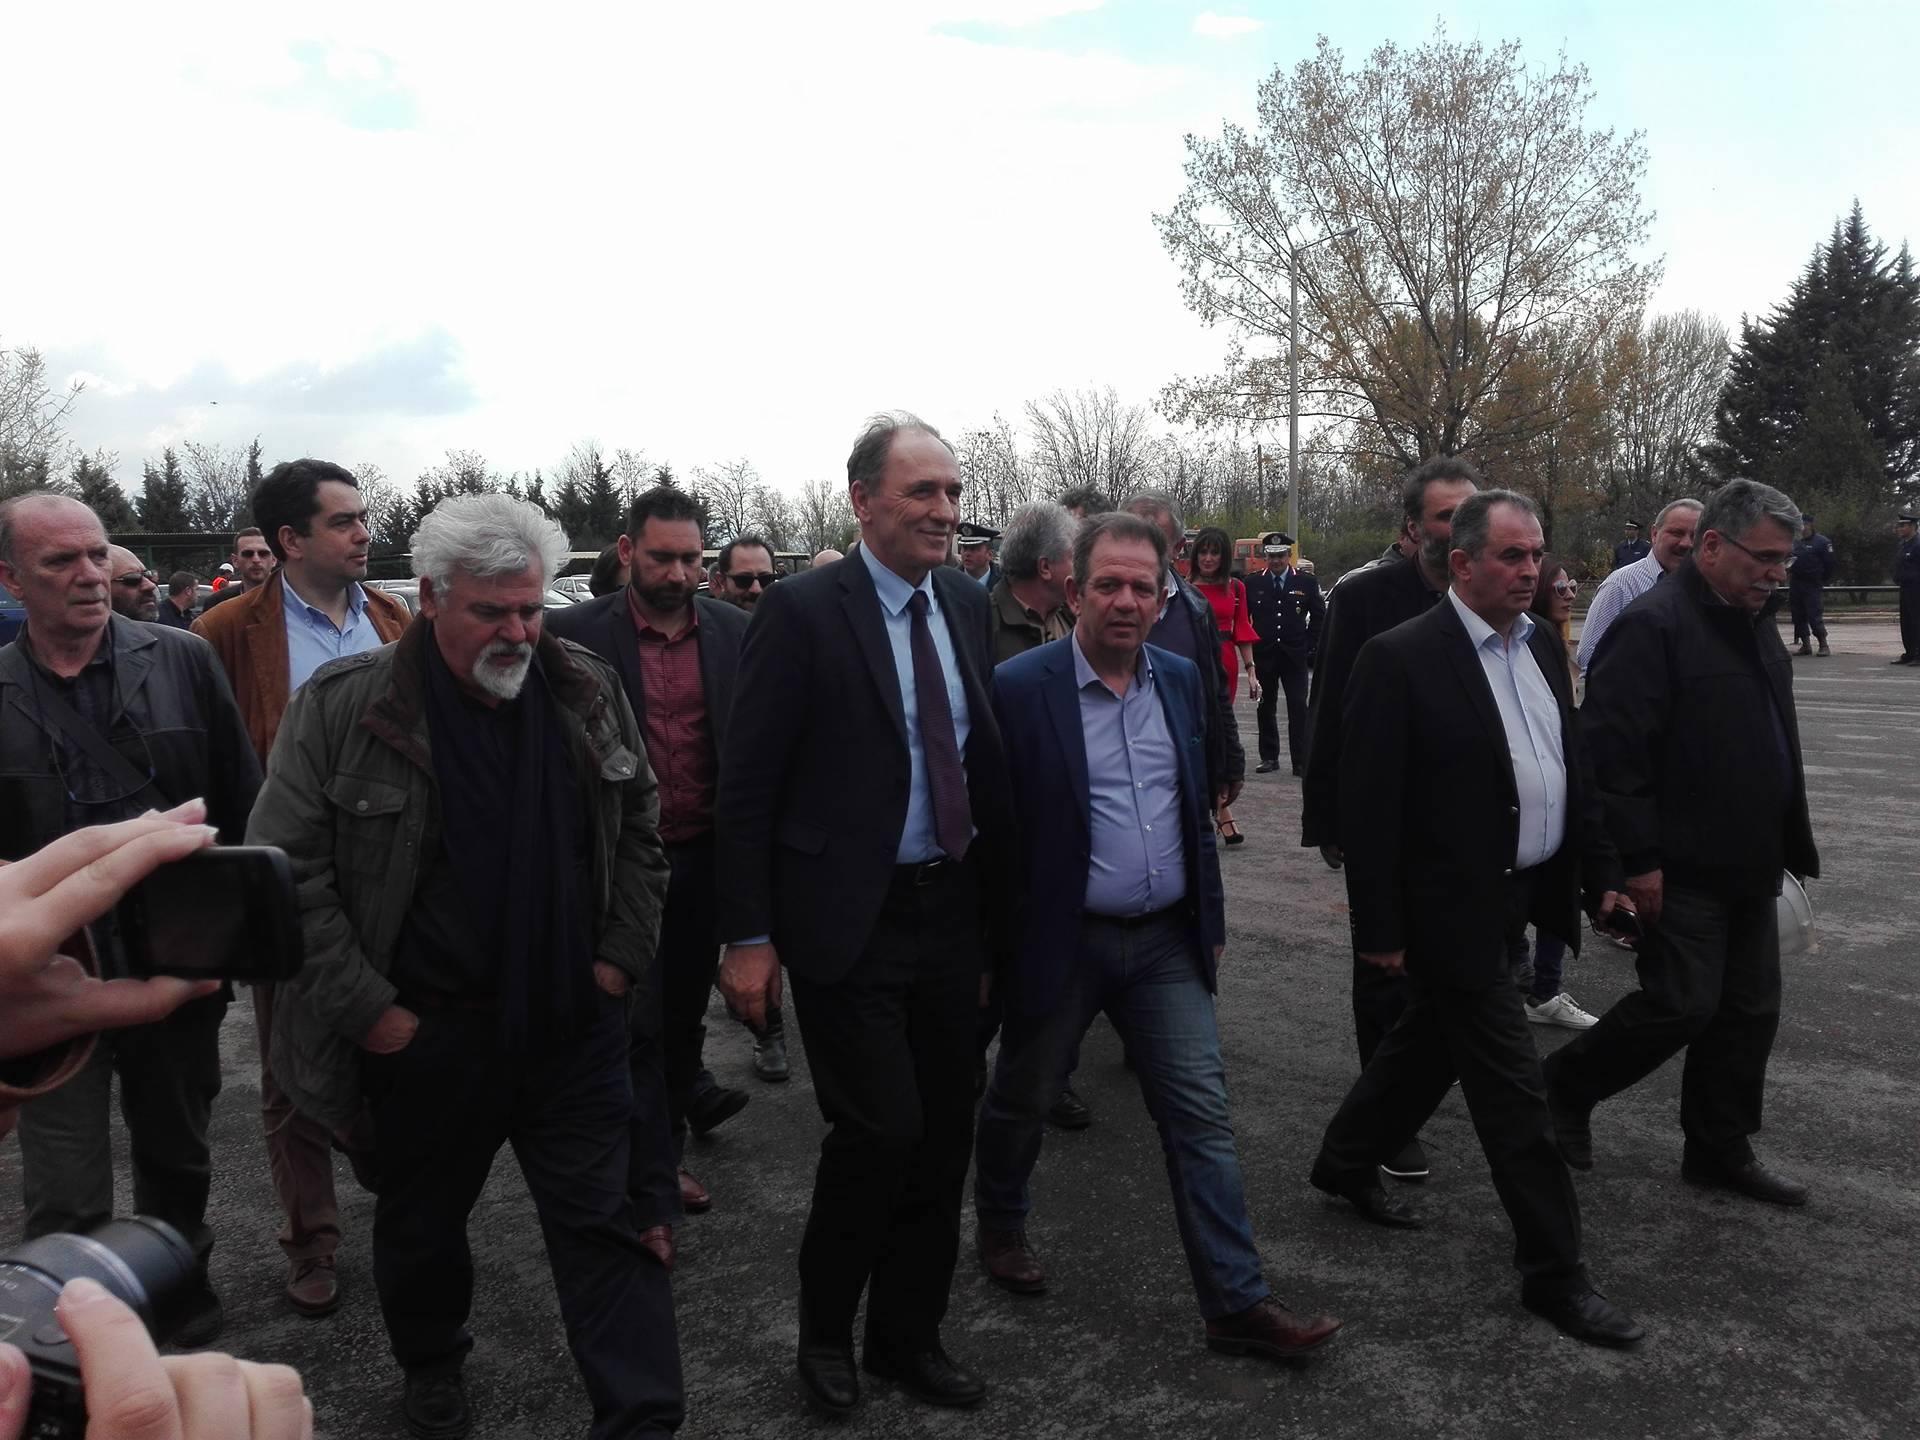 kozan.gr: Στο Νότιο Πεδίο της ΔΕΗ ο υπουργός Ενέργειας και Περιβάλλοντος, Γιώργος Σταθάκης (Bίντεο & Φωτογραφίες)